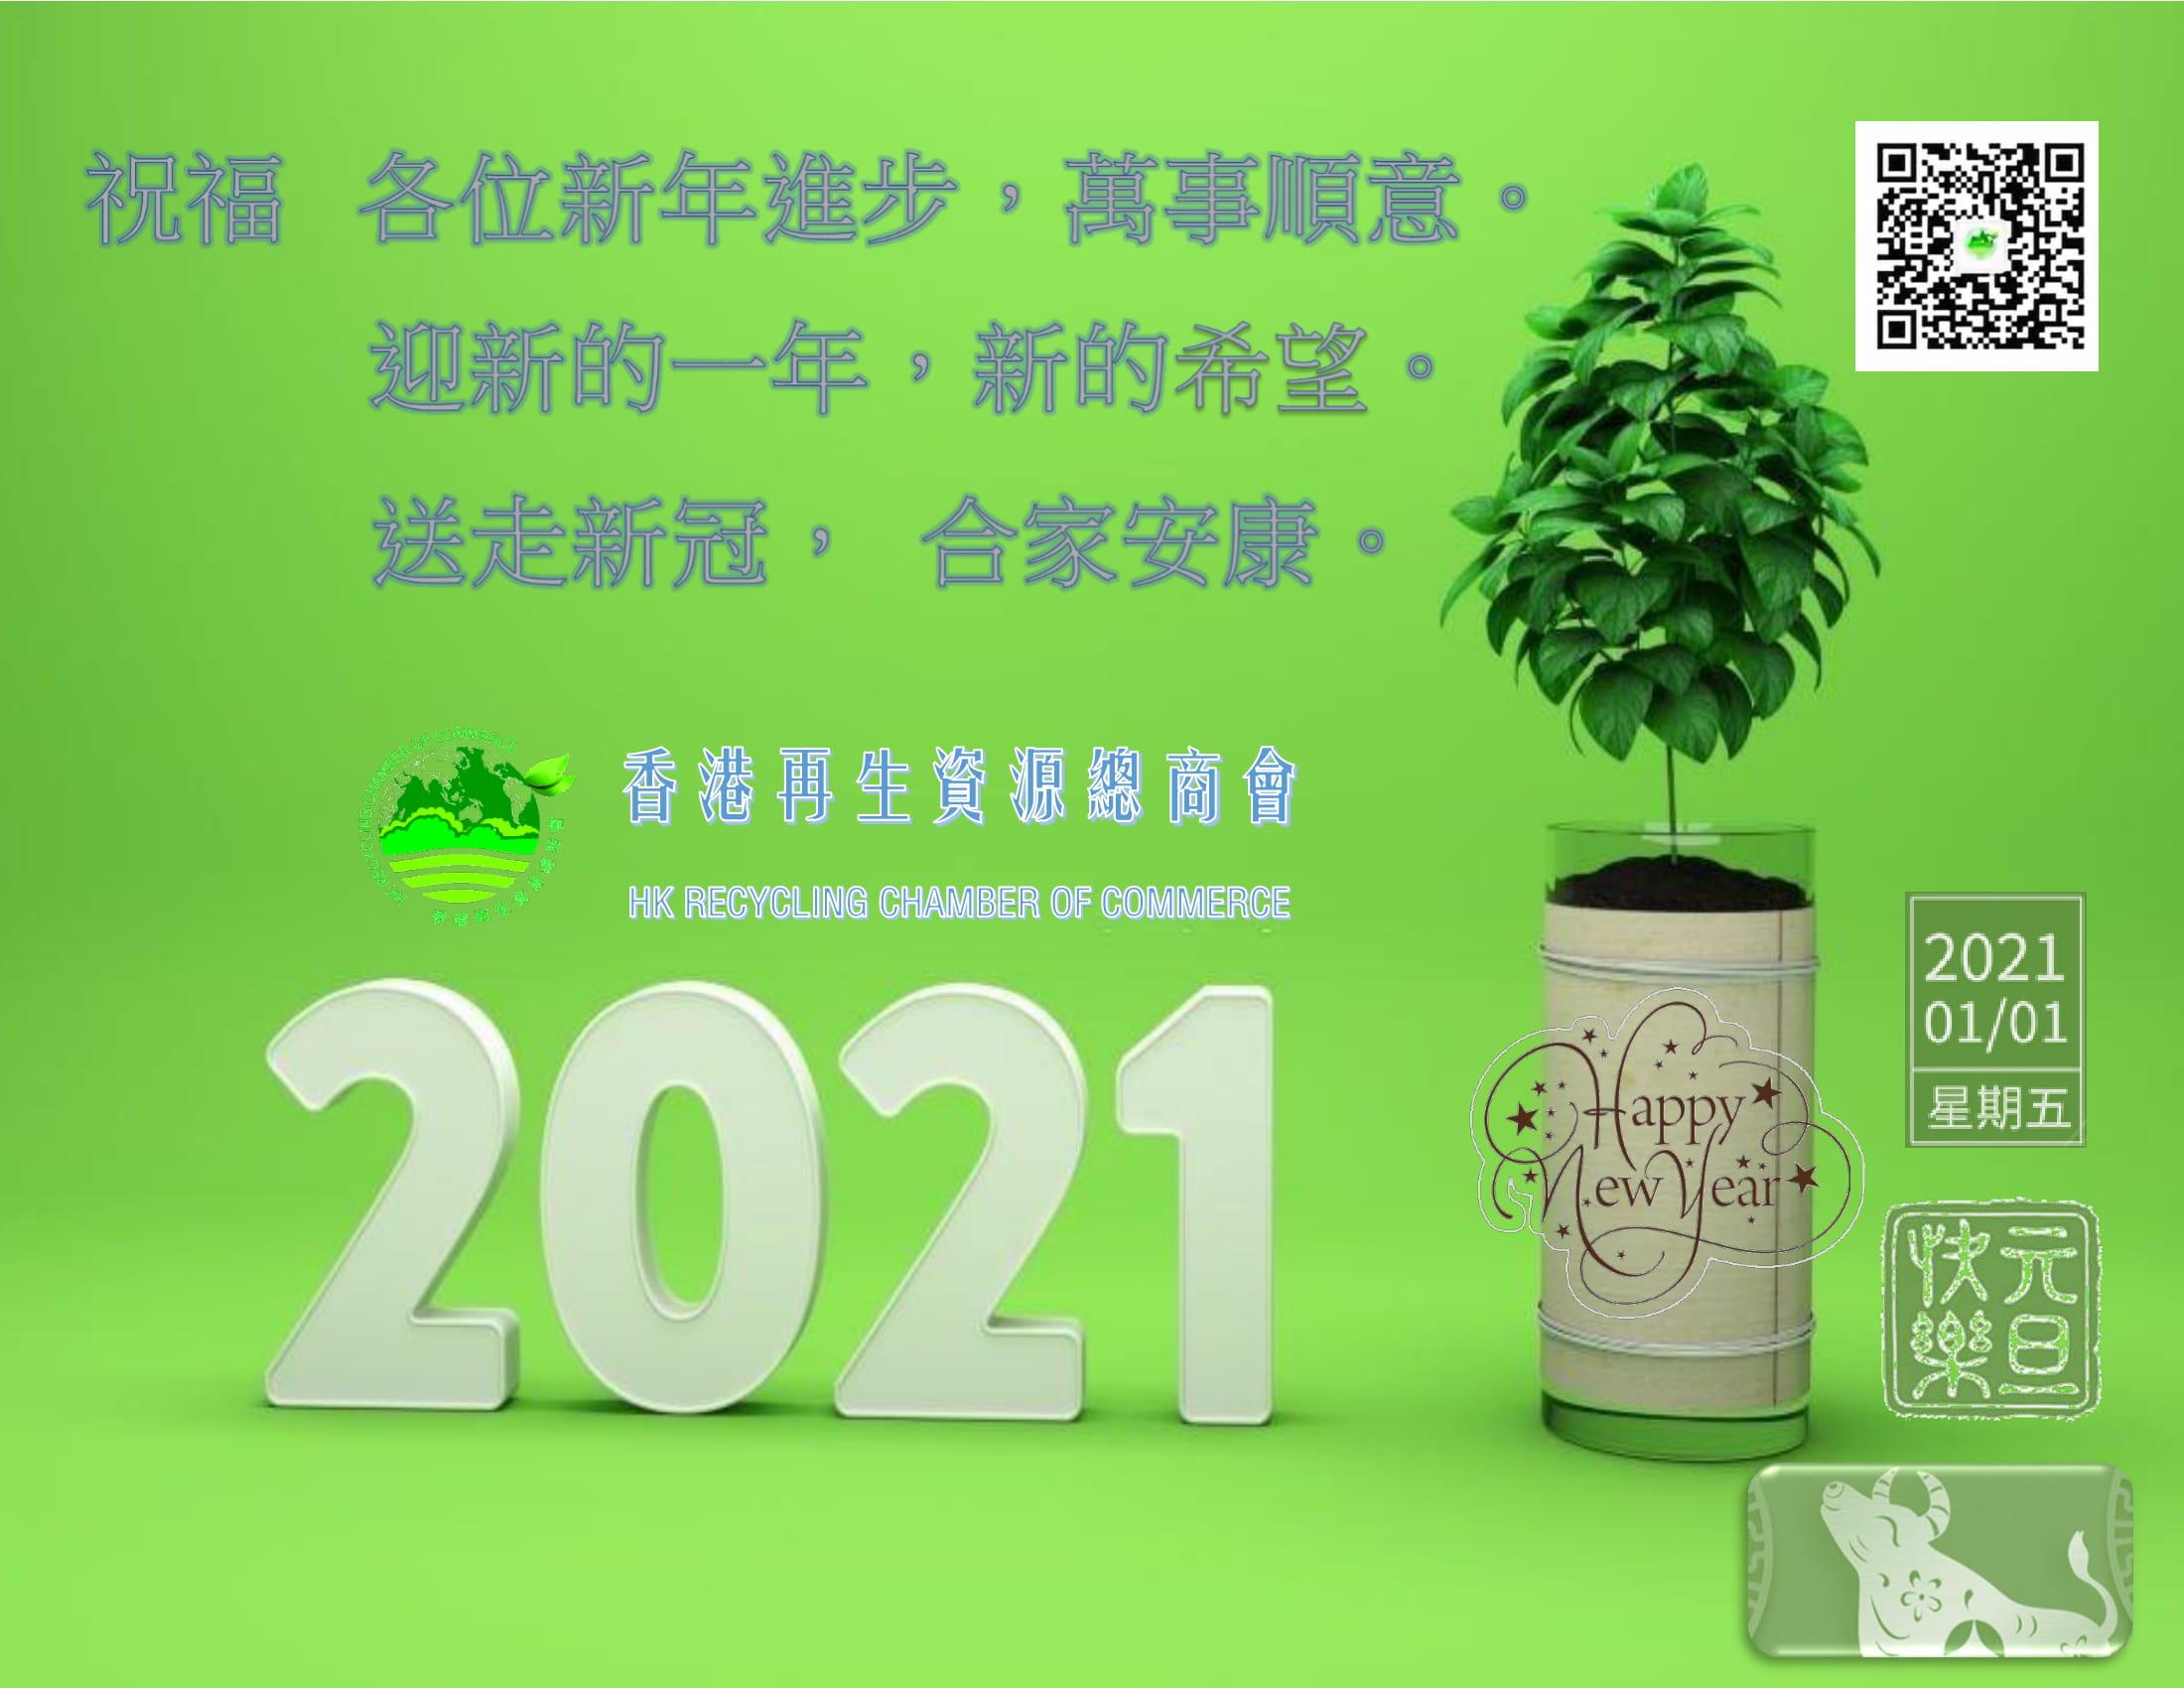 2021 HAPPY NEW YEAR-1